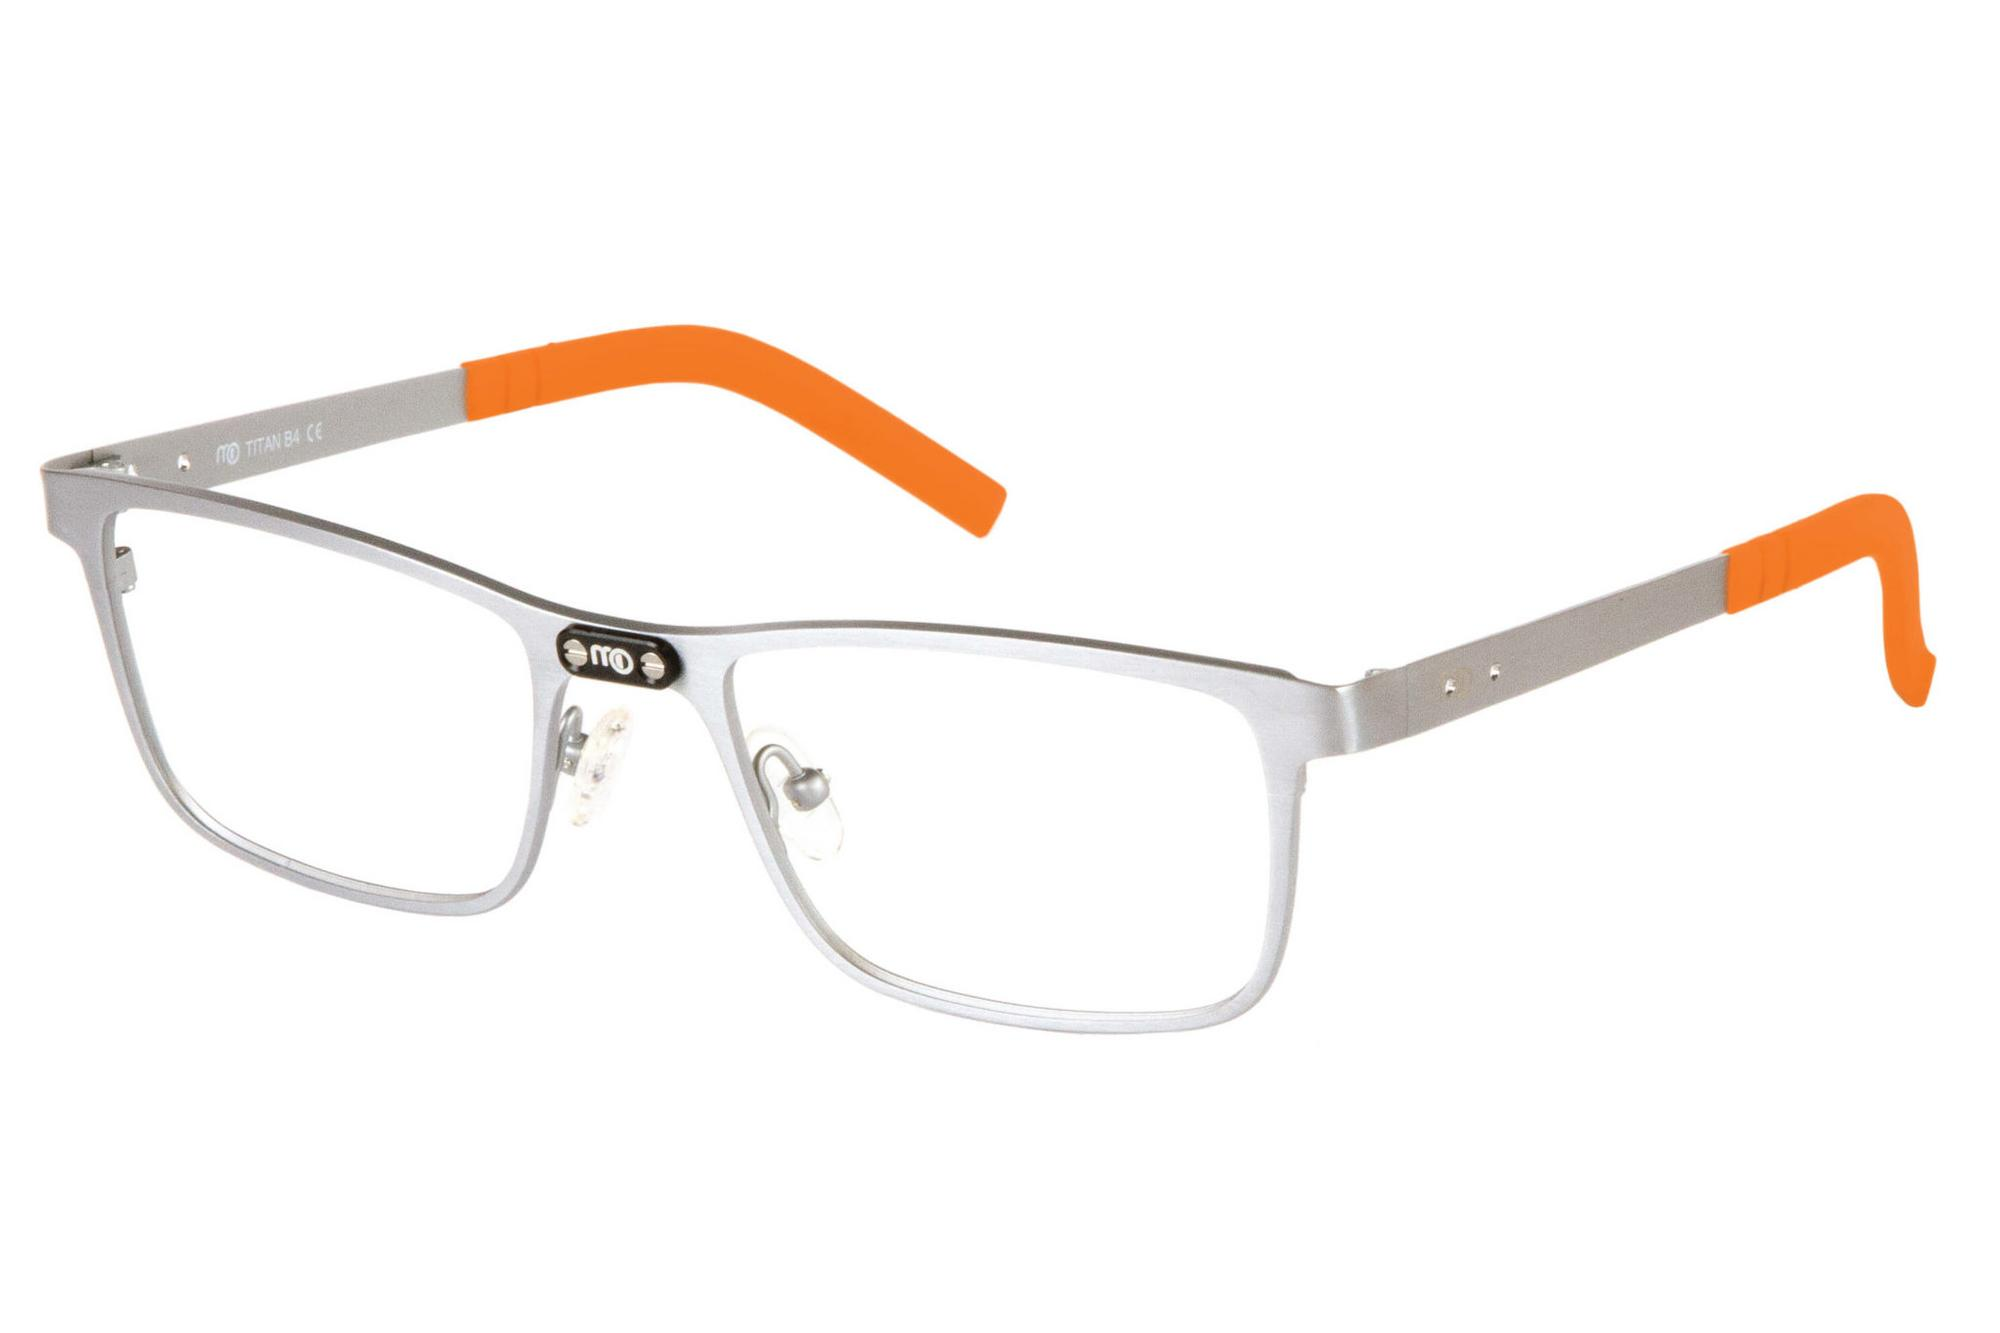 Frame Mooptics Titan B4 Main Orange